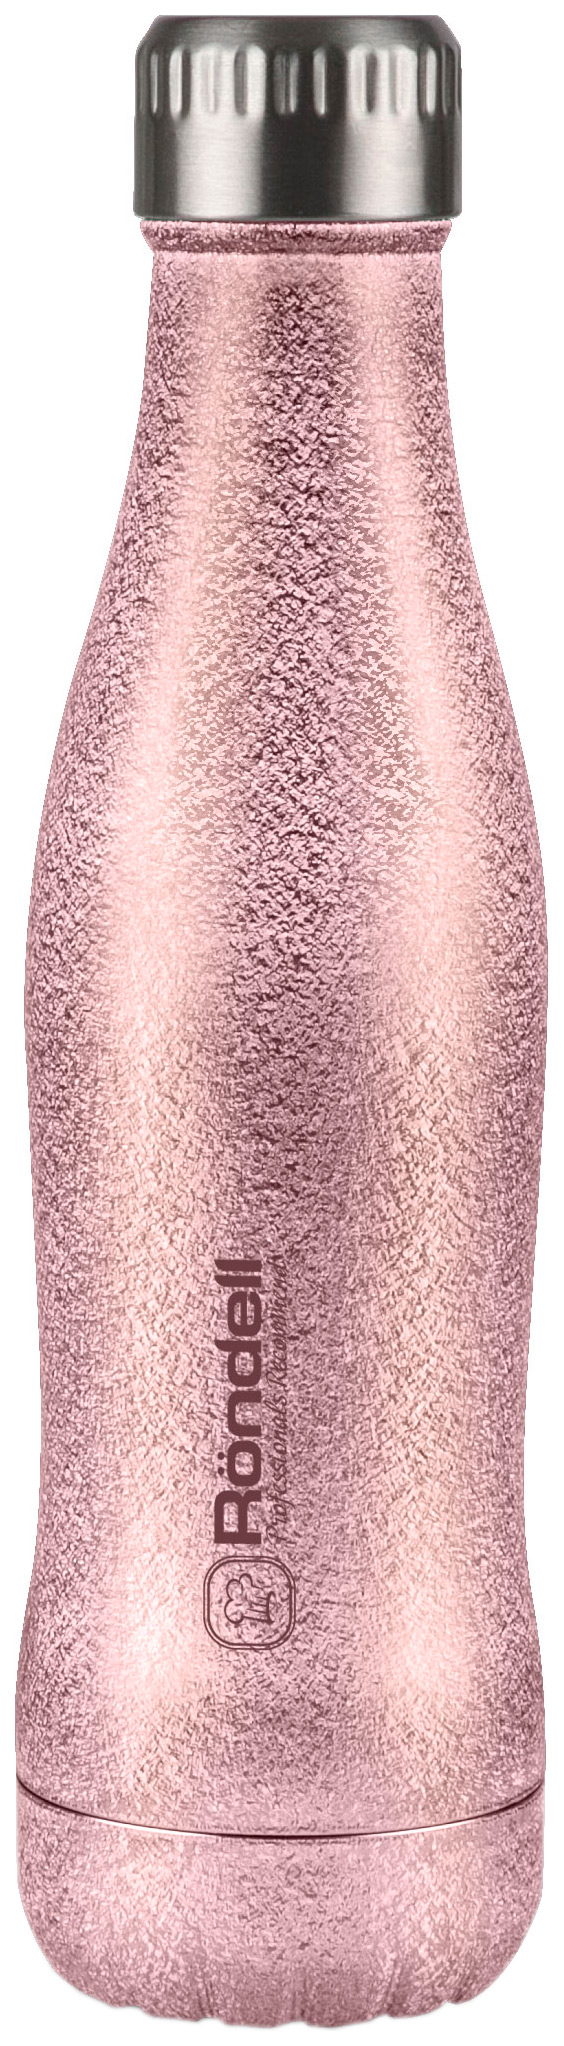 Термос Röndell Disco 0,4 л розовый фото